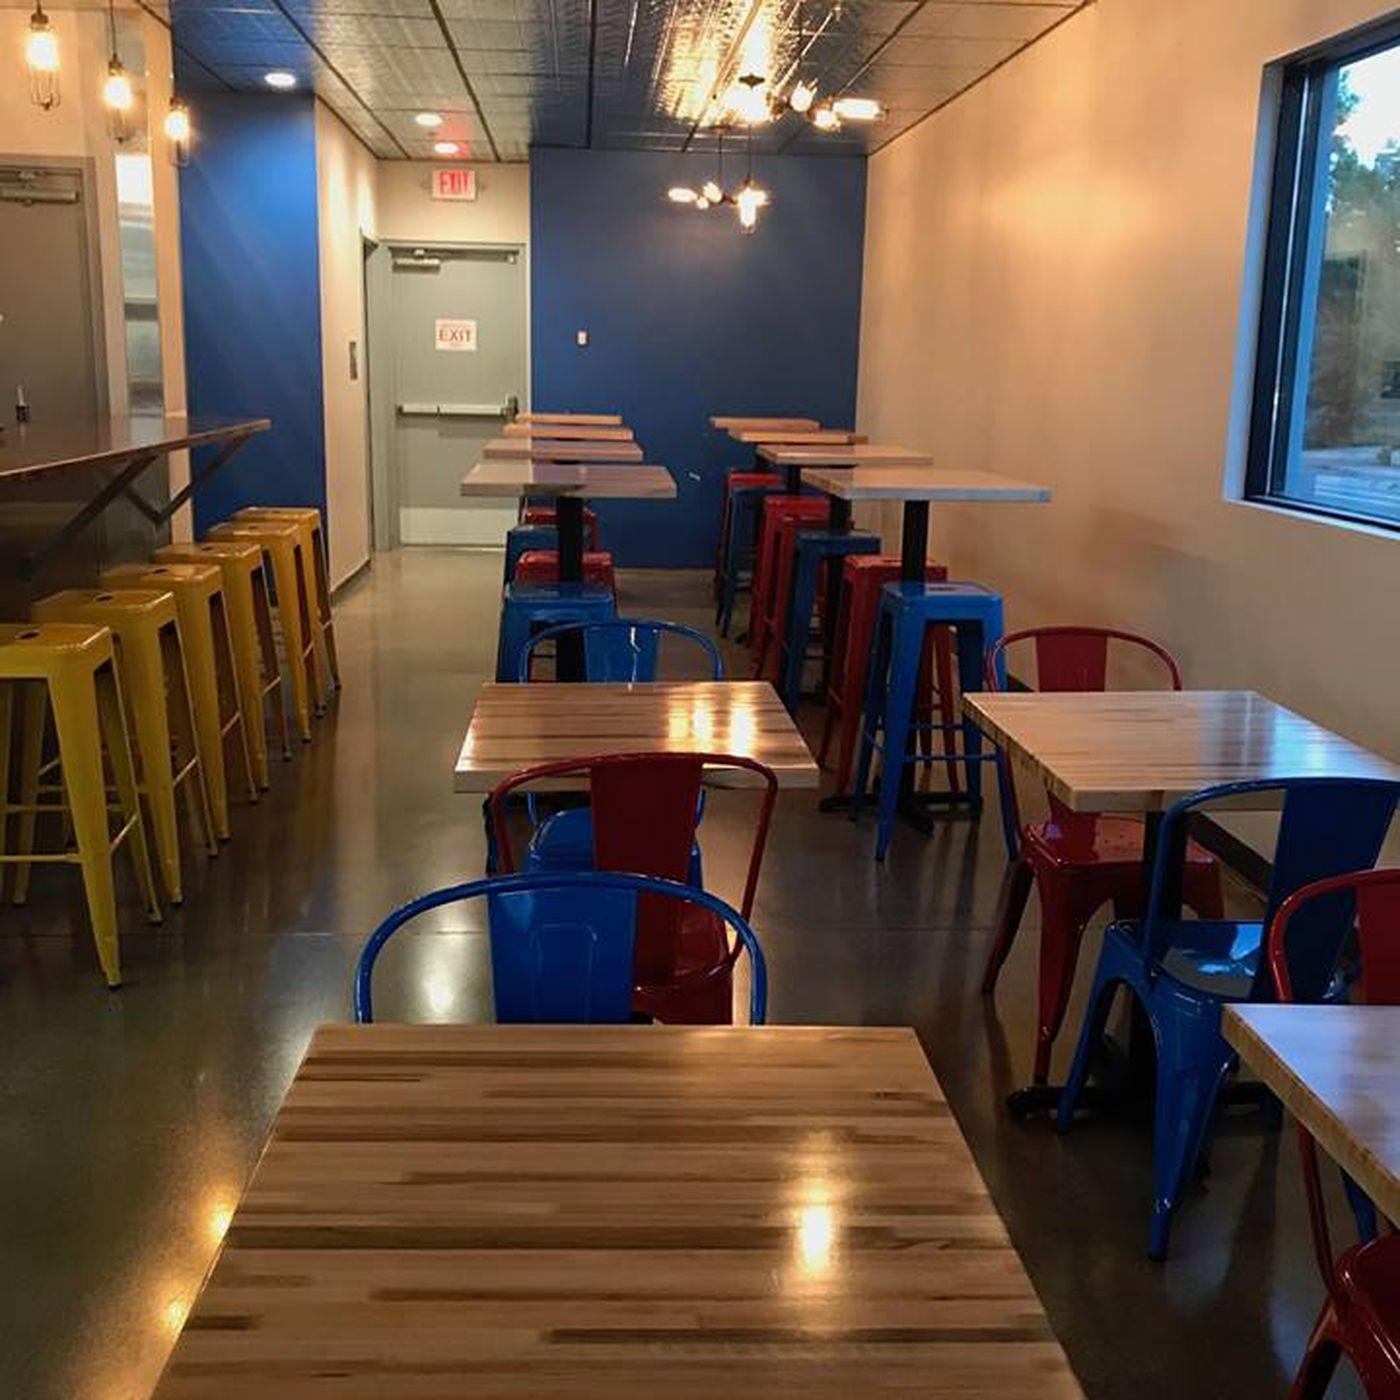 New Filipino Mexican Restaurant Slides Into Little Mekong Next Week Eater Twin Cities